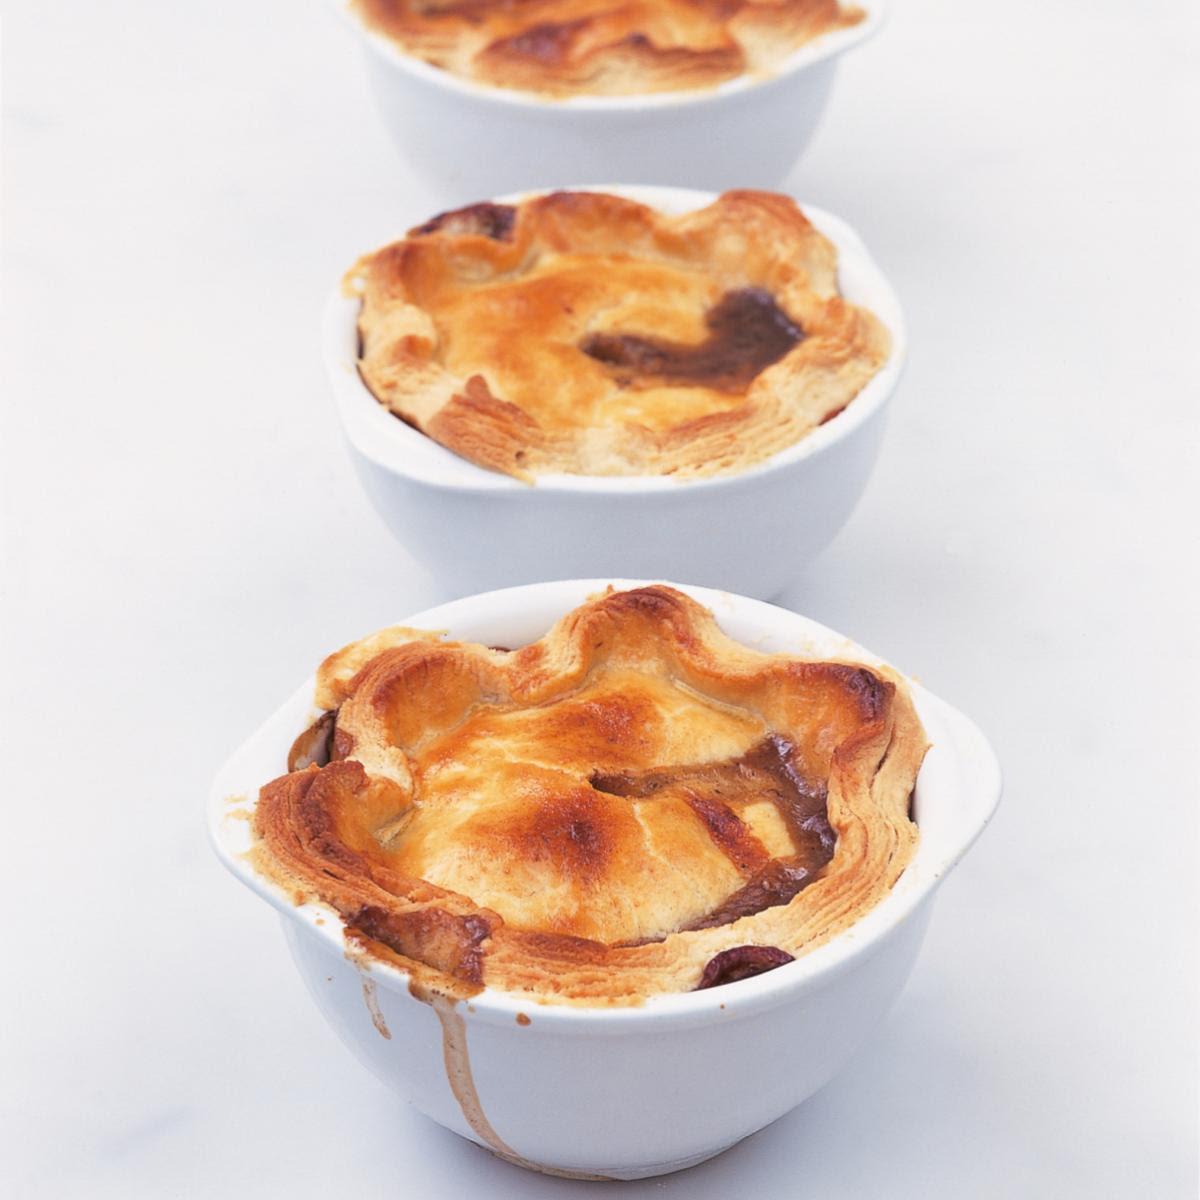 Winter Vegetable Pie with a Parmesan Crust | Delia Online